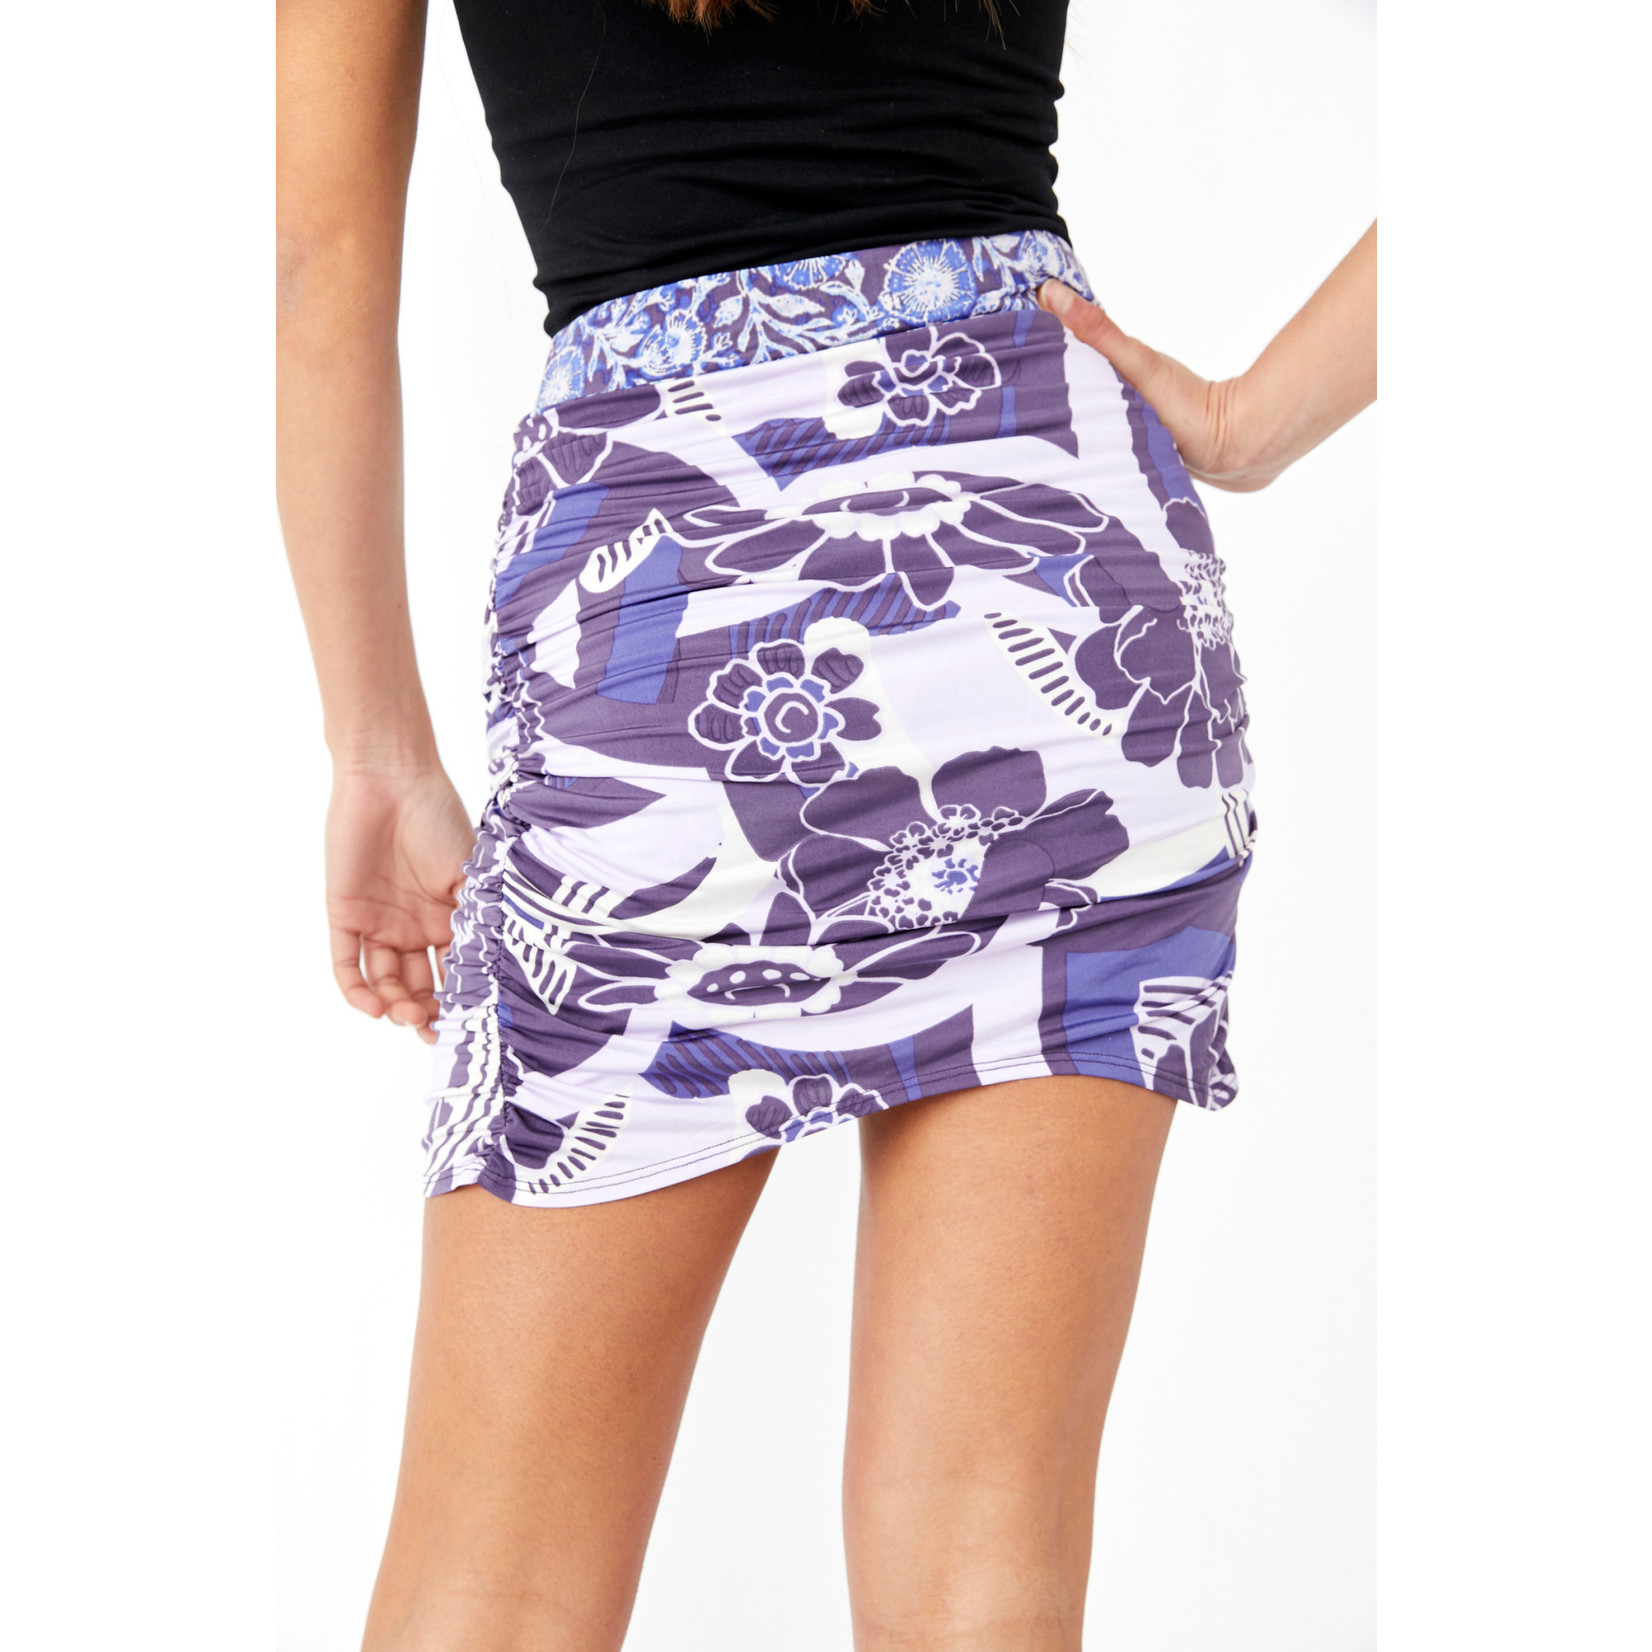 Free People She's Something Else Printed Skirt